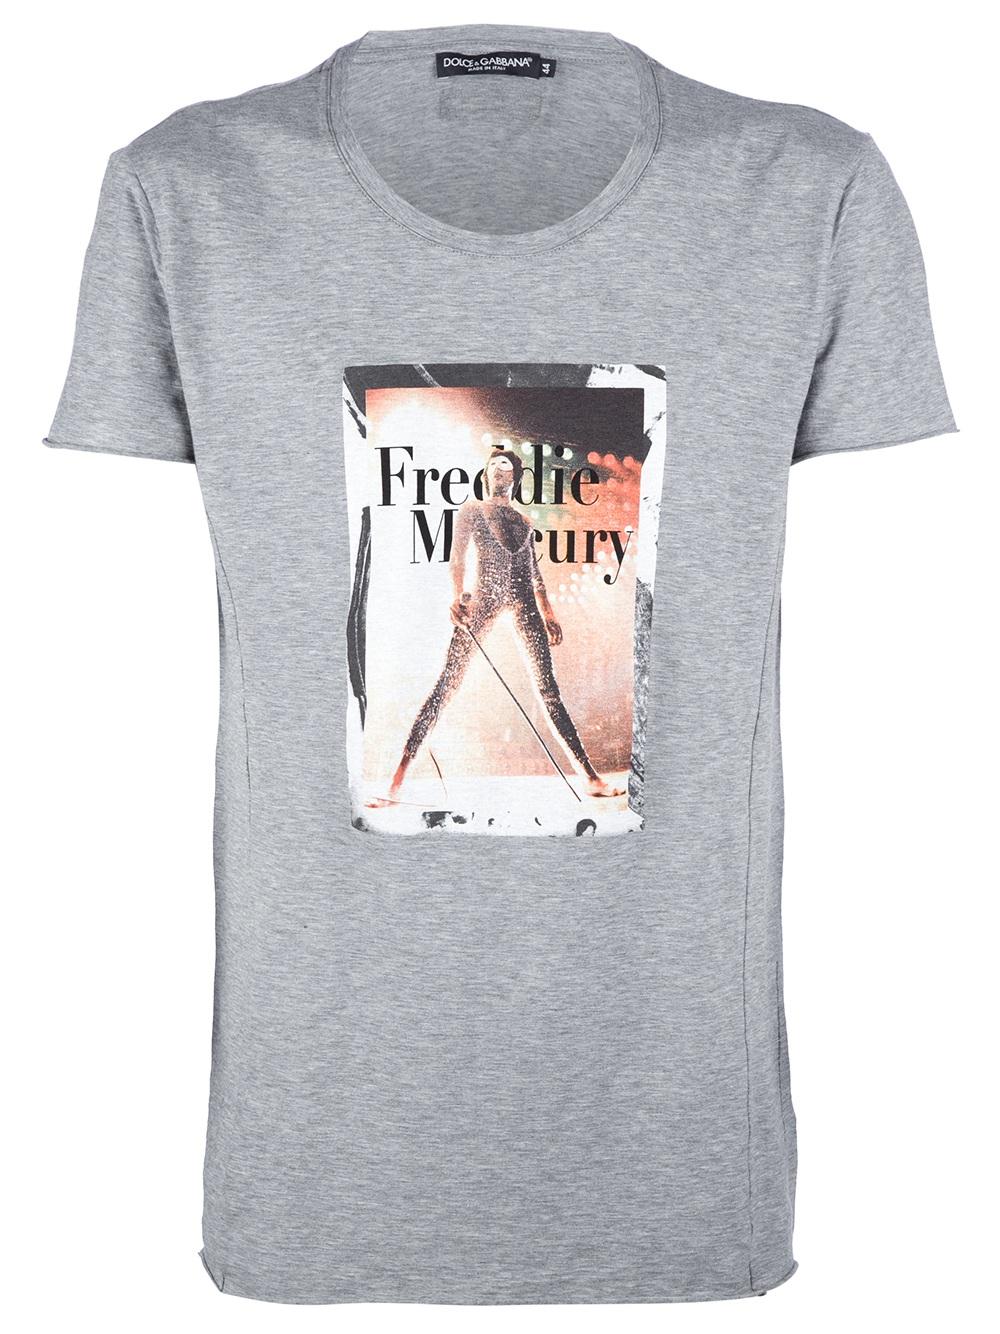 Dolce Gabbana Freddie Mercury T Shirt In Gray For Men